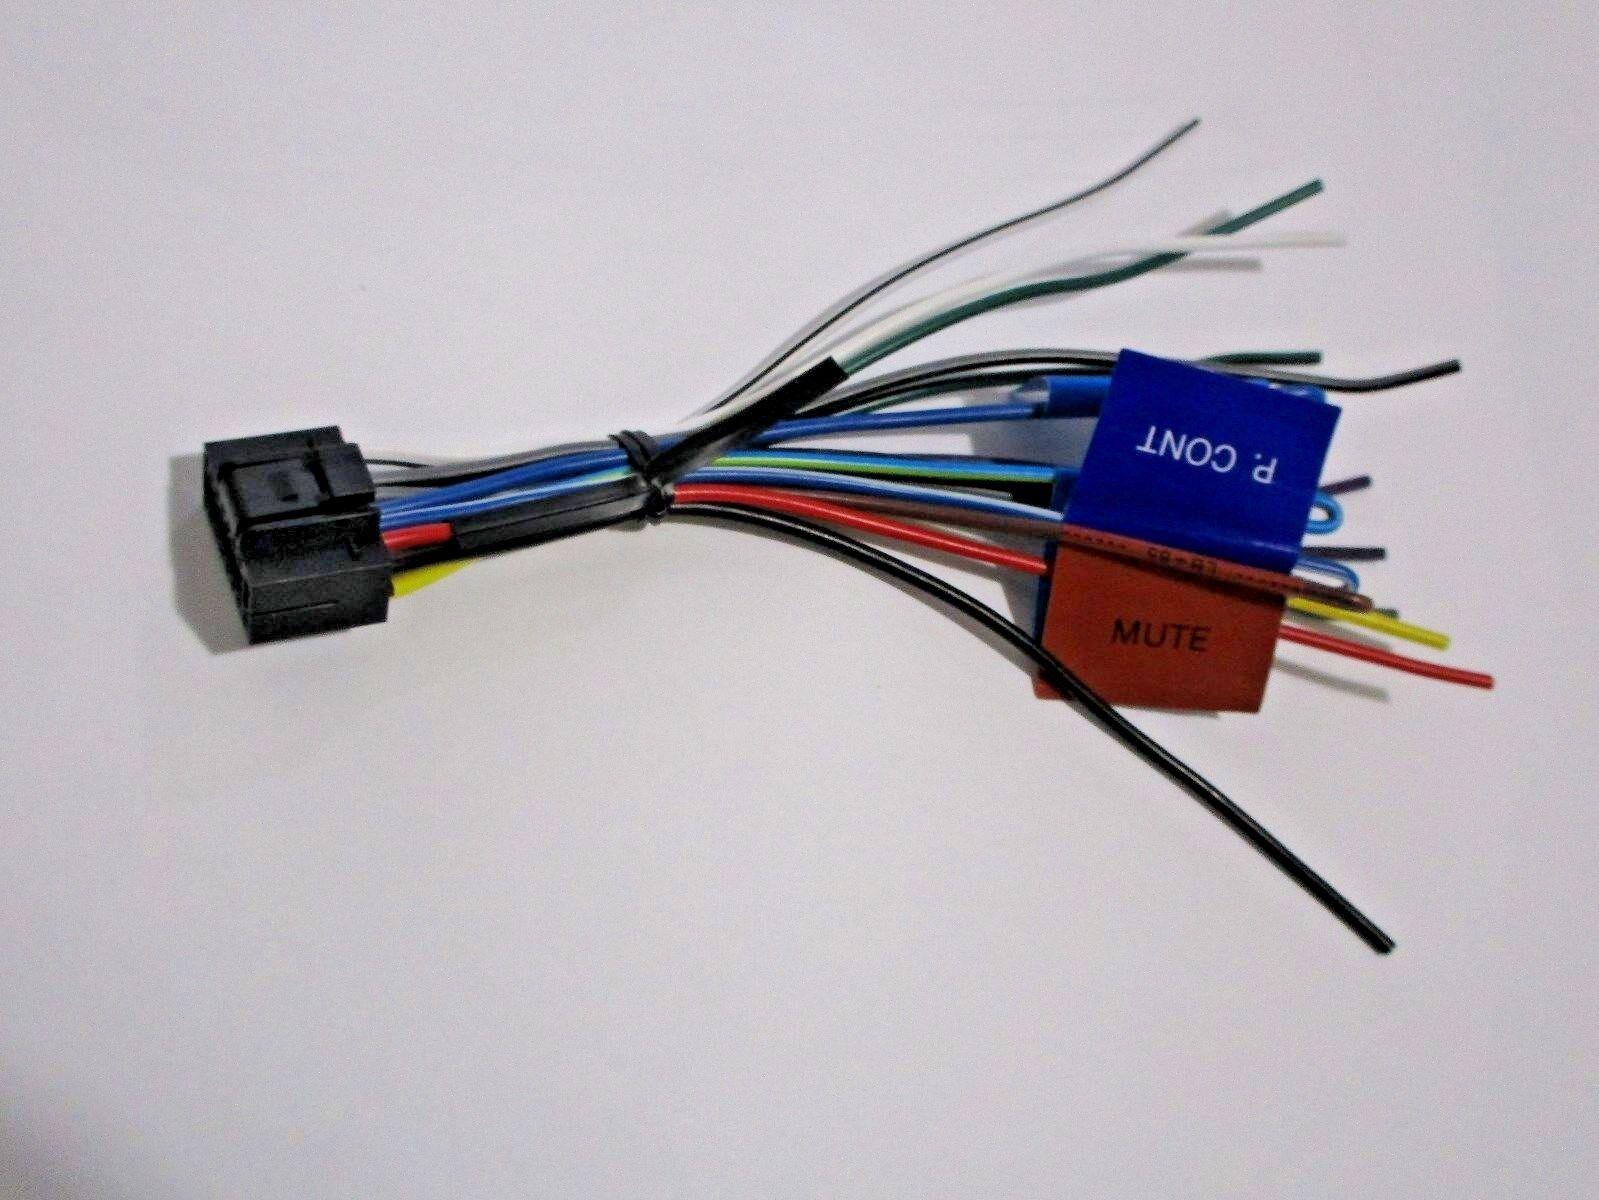 Kenwood Kdc Mp205 Wiring Harness Free Diagram For You Car Audio Dash Unit Mp435u Mp235 Aux